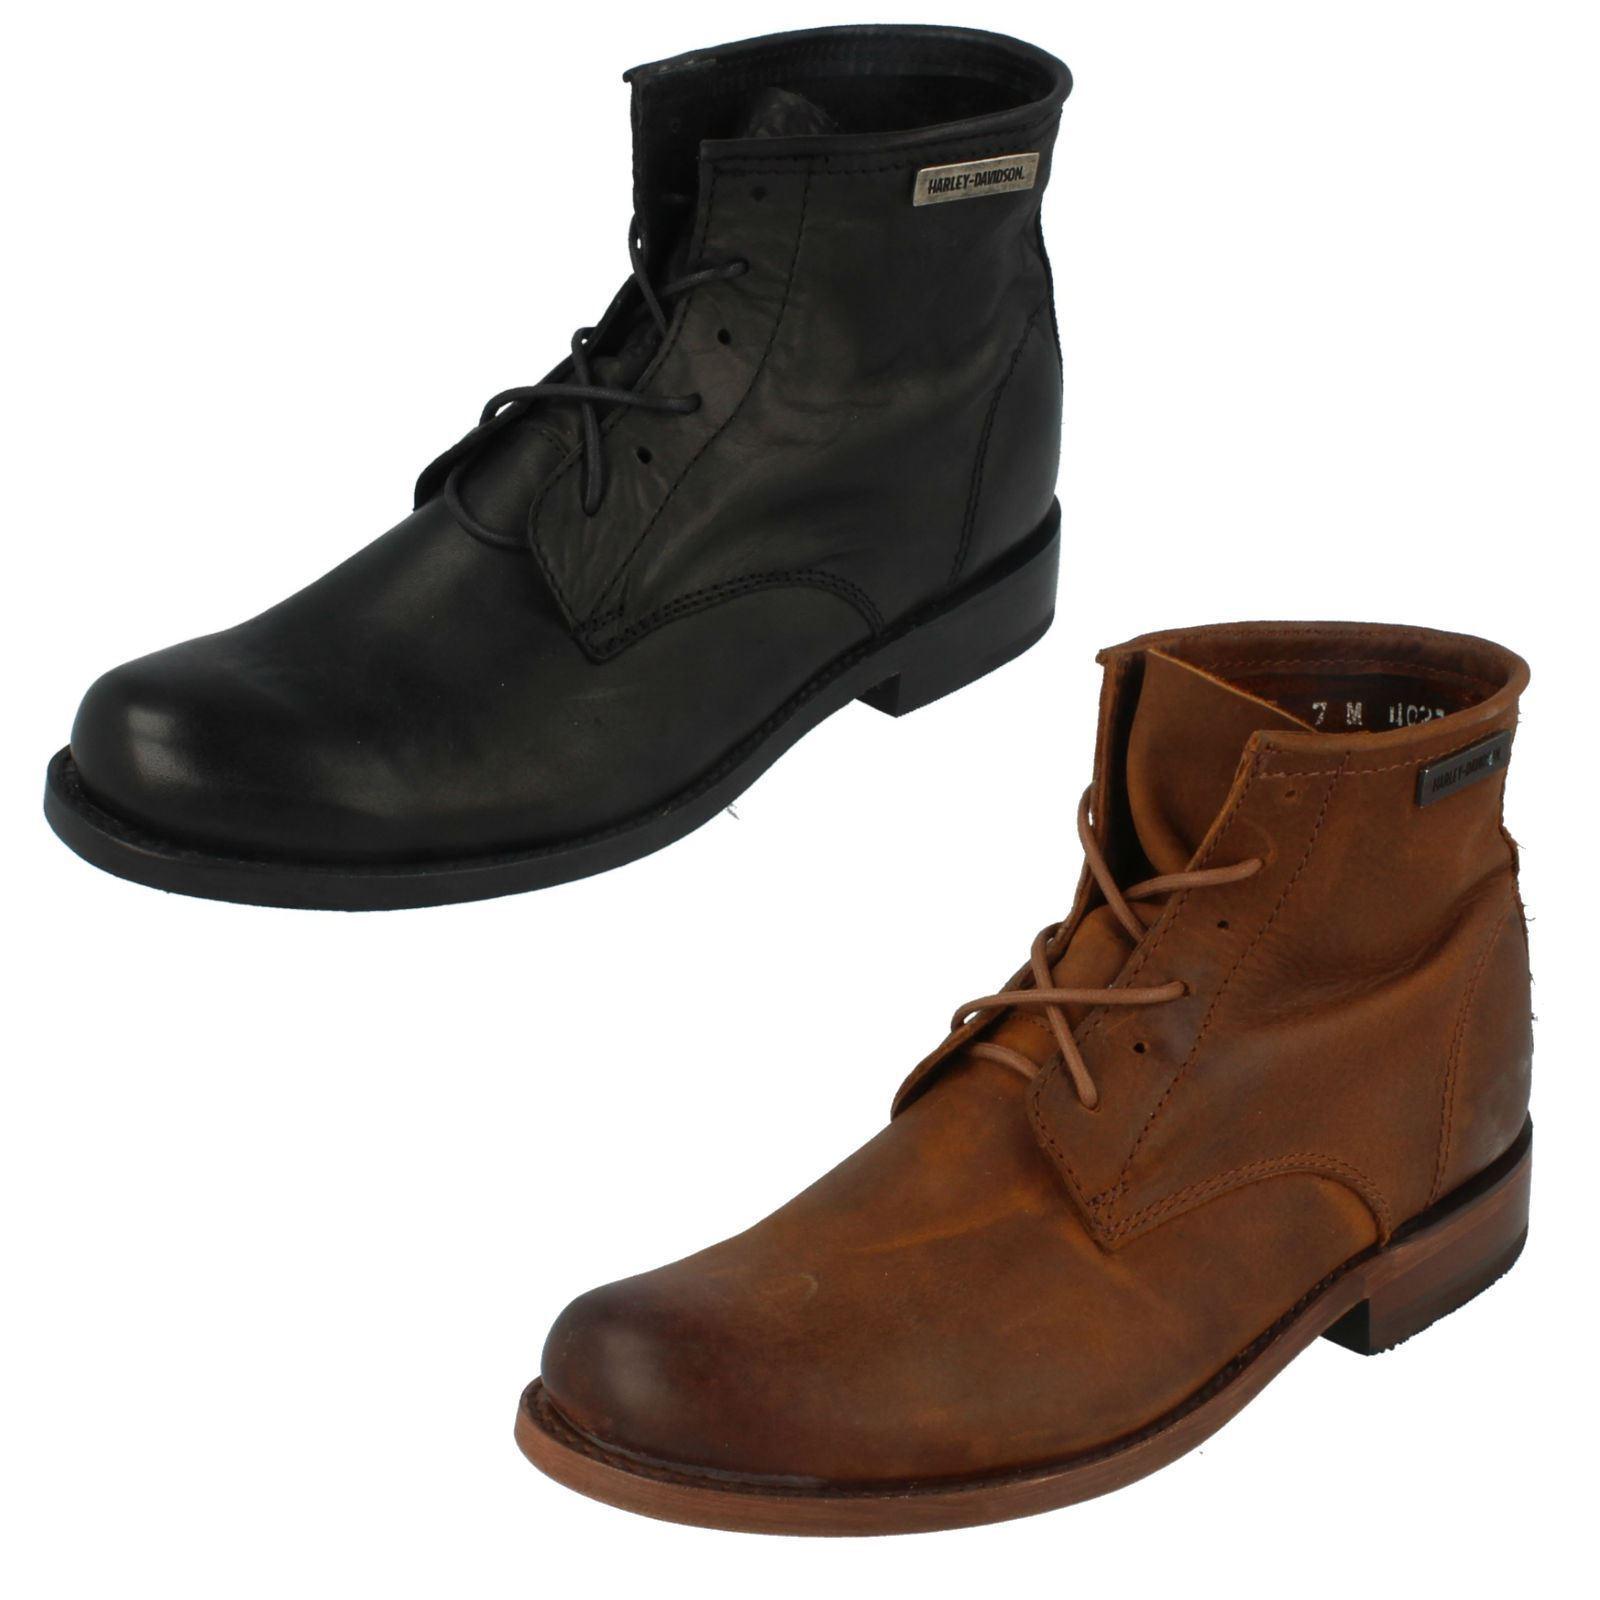 Men's Harley Davidson Ankle Boots - Tarrson